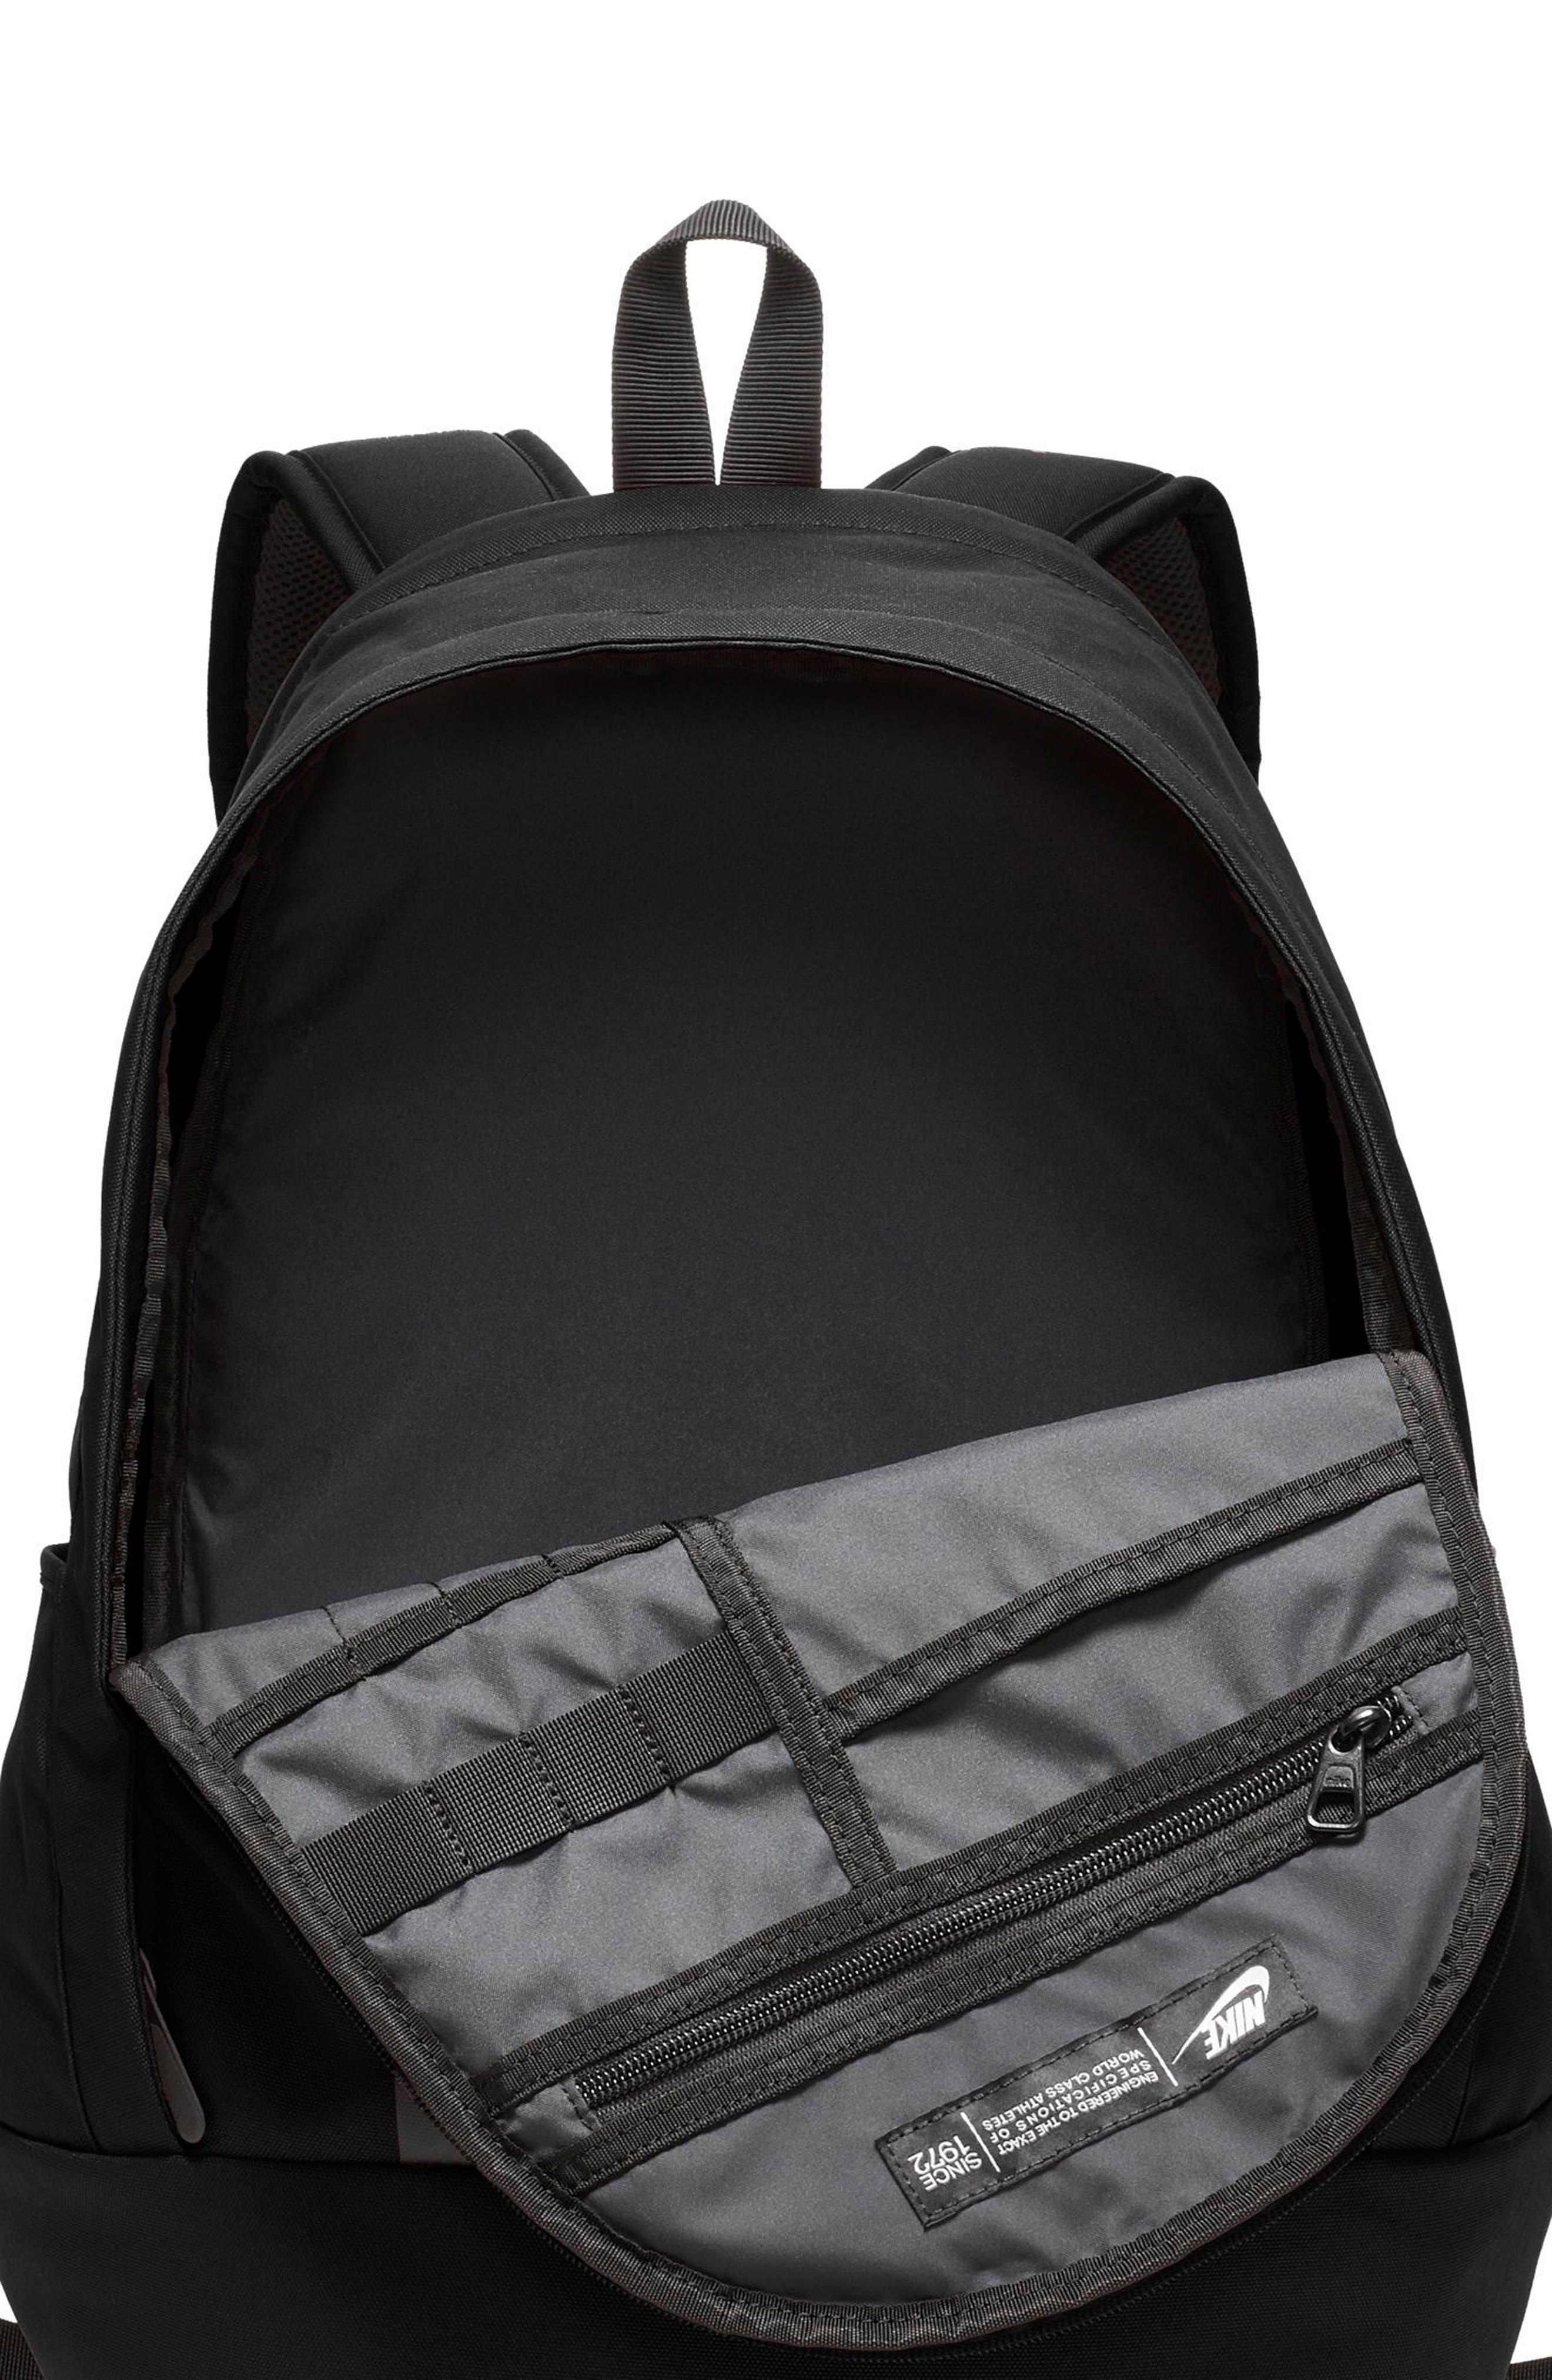 Cheyenne Backpack,                             Alternate thumbnail 4, color,                             Black/ Black/ Black